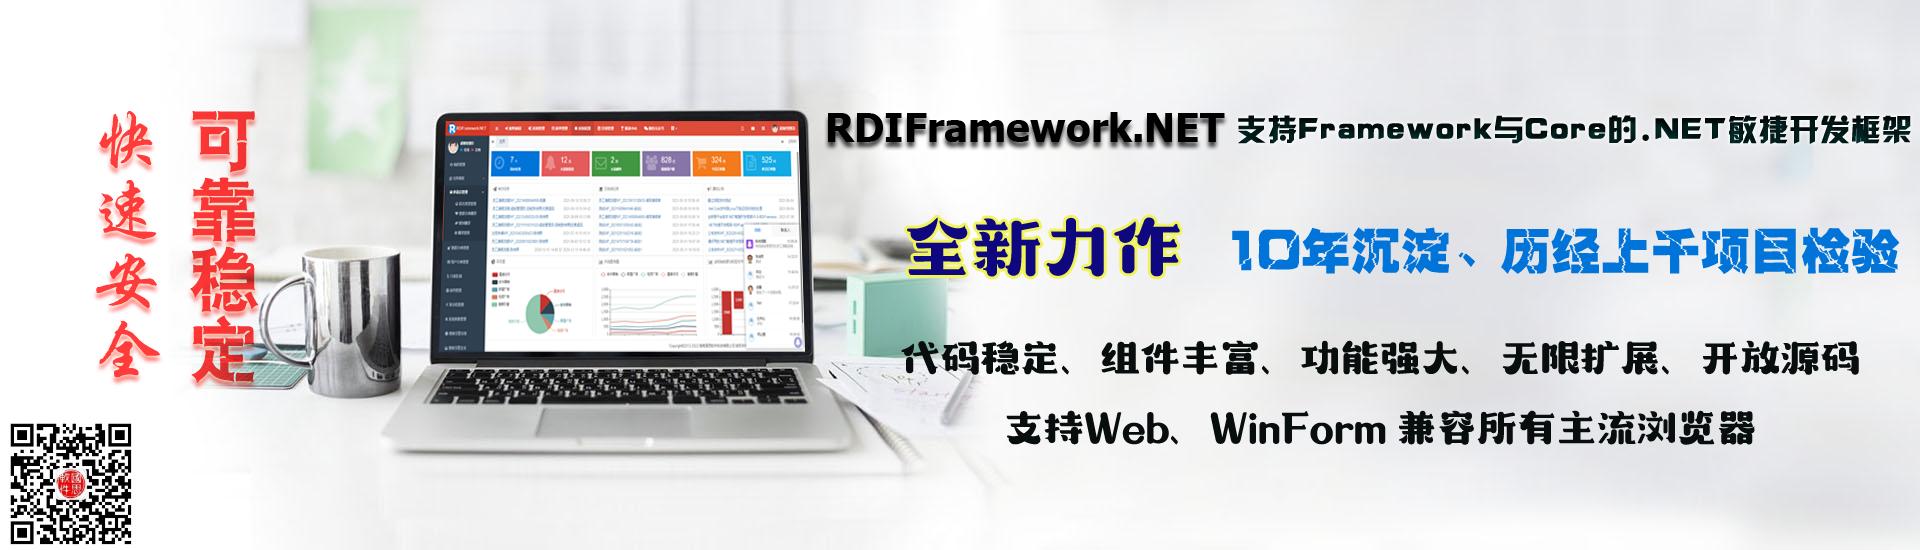 .NET敏捷开发框架-RDIFramework.NET V5.1发布(跨平台)